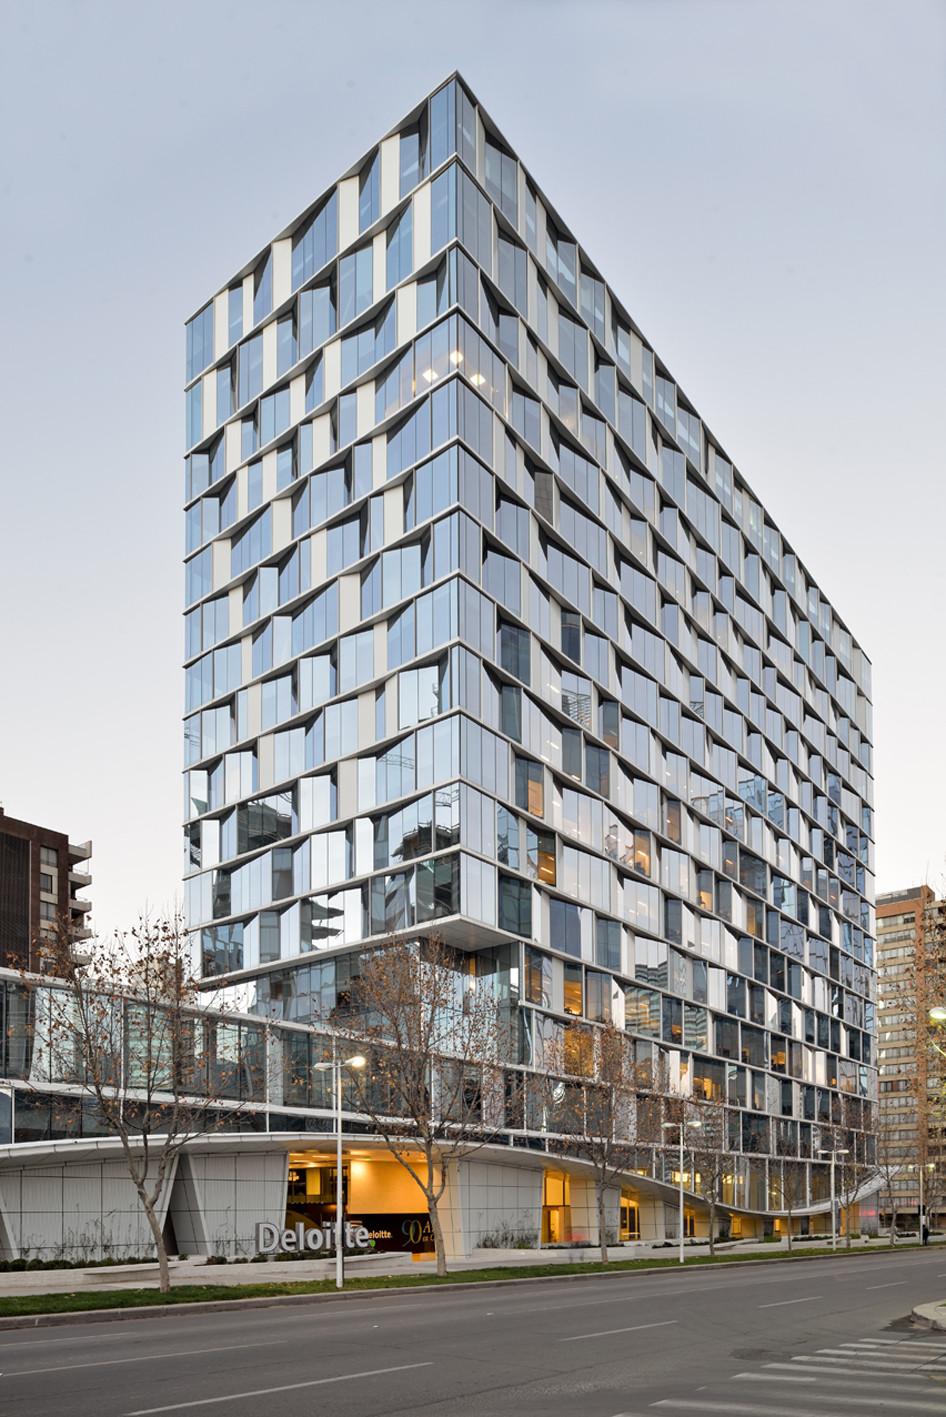 Deloitte building cfa cristi n fernandez arquitectos for Hotel design facade